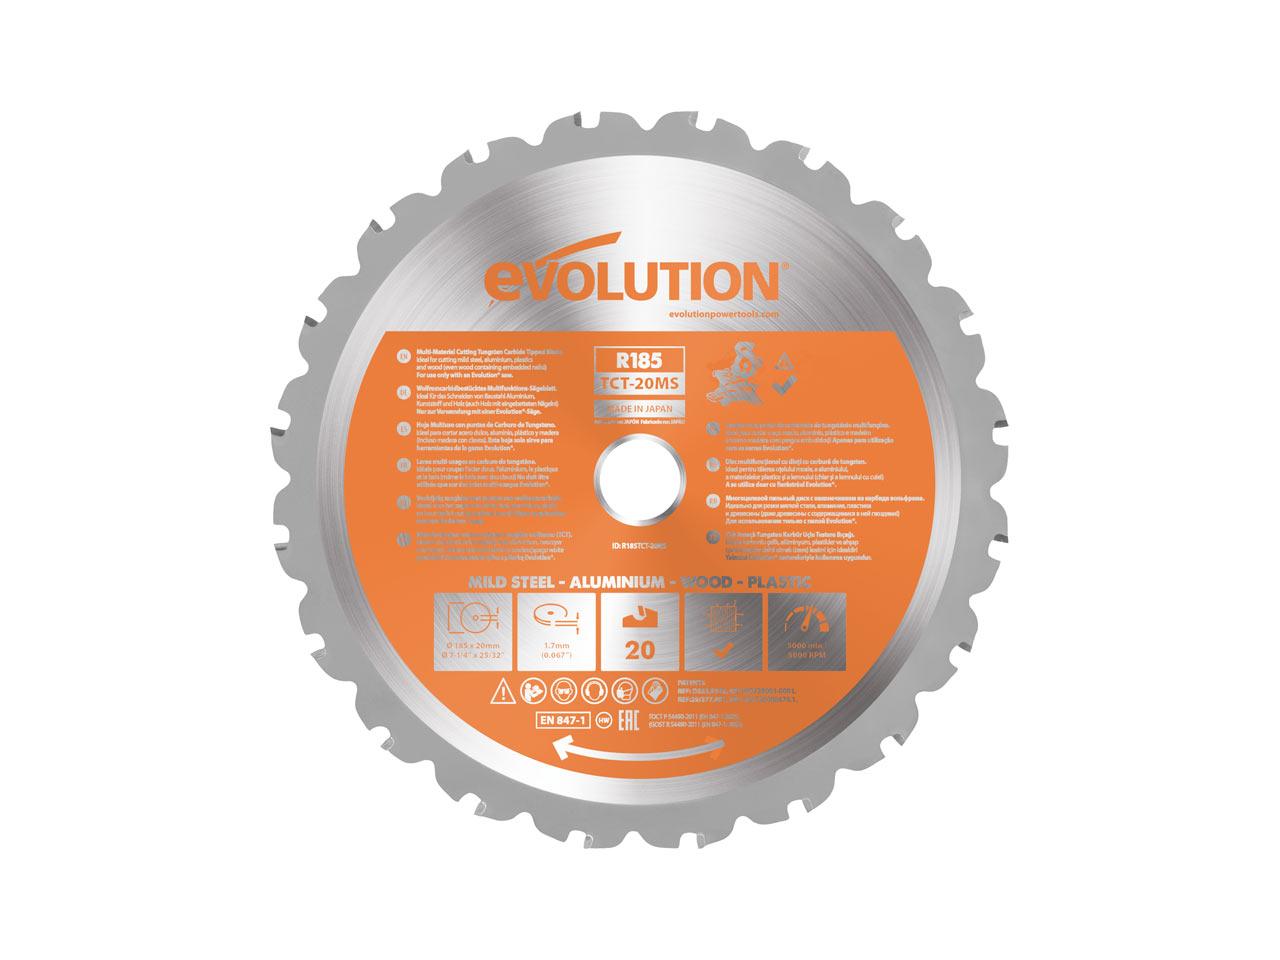 Evolution_R185TCT-20MS.jpg